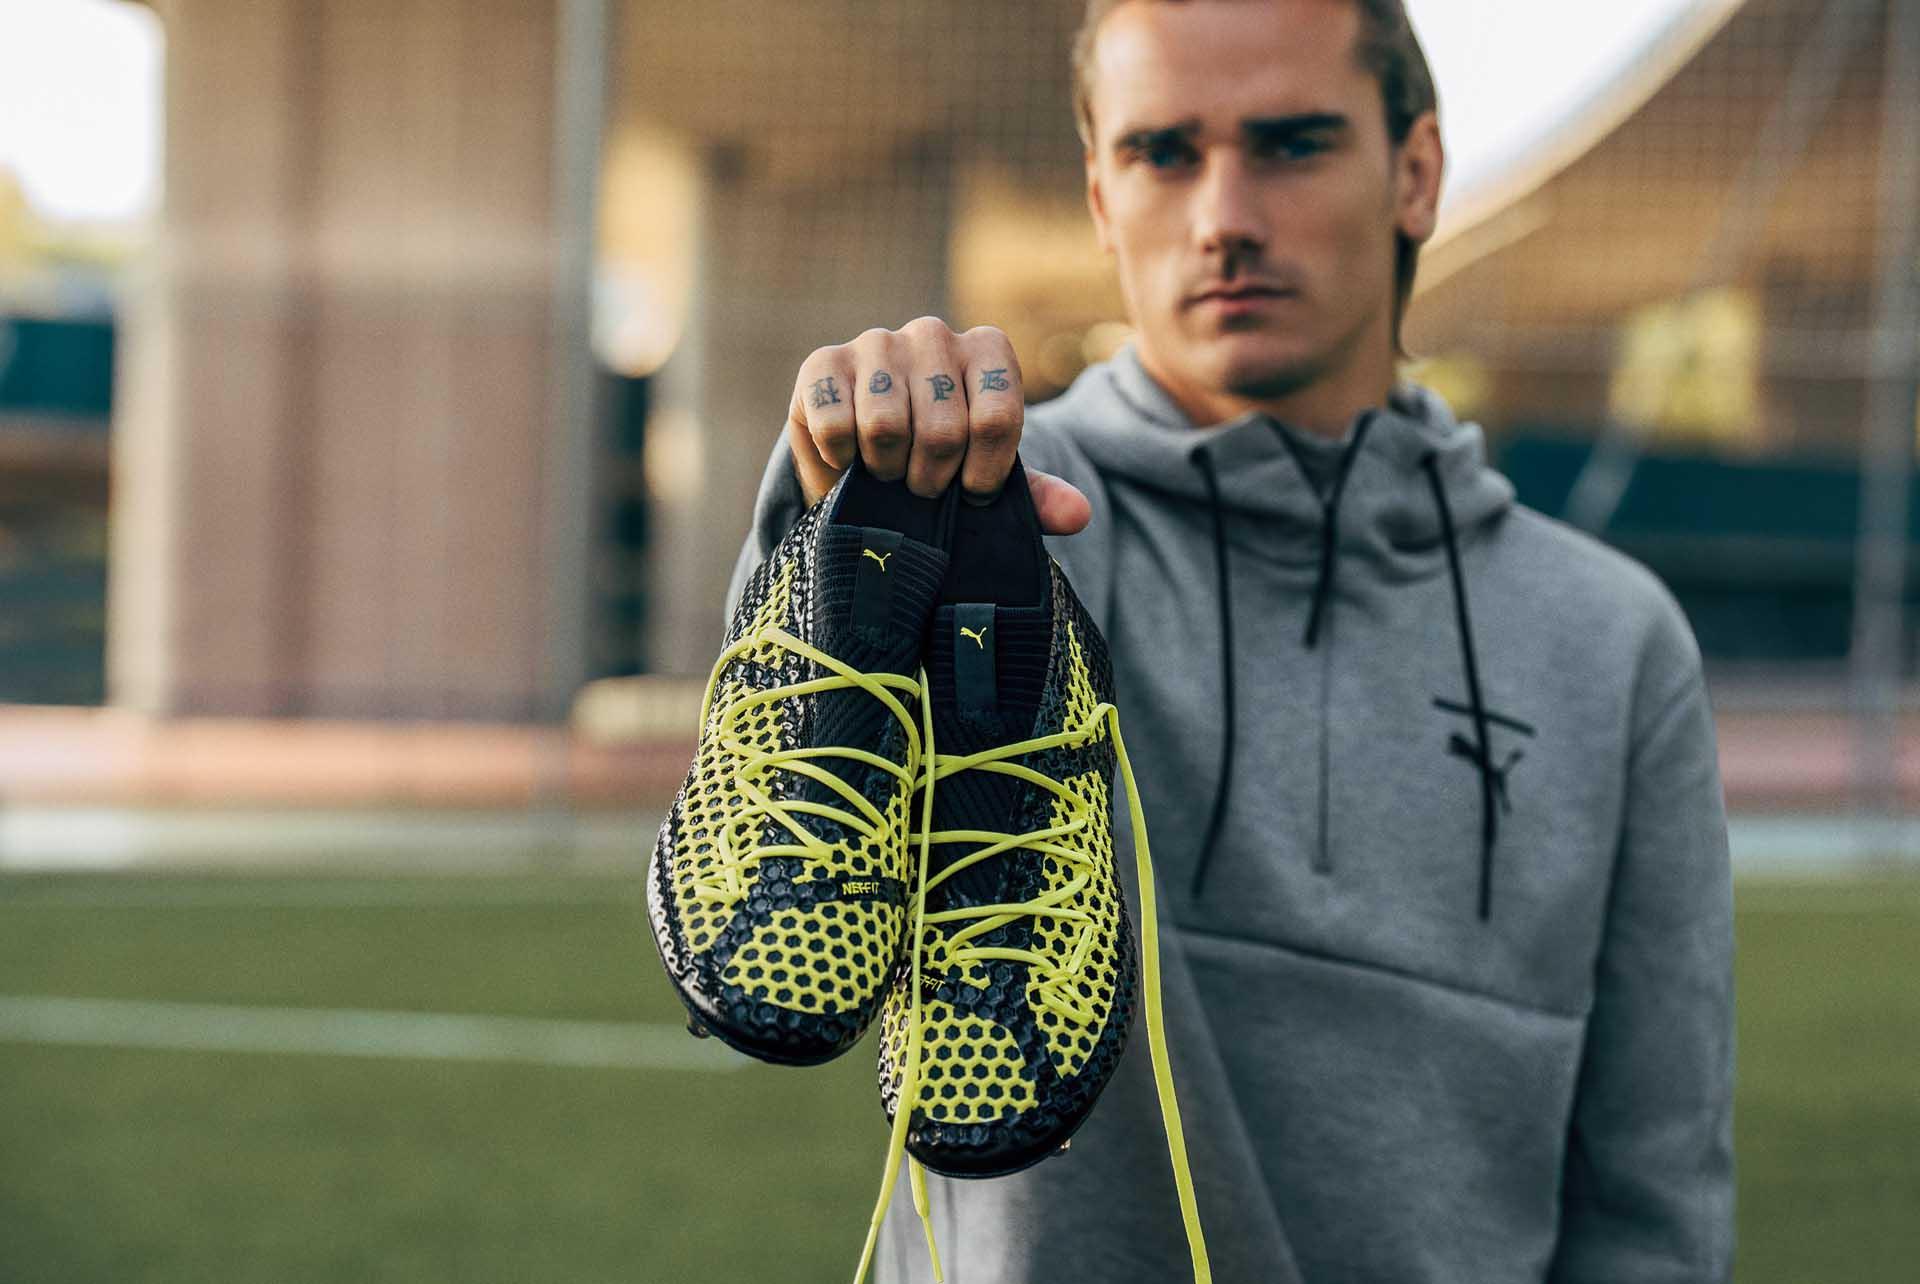 3c41db9c6710 PUMA Launch the FUTURE 18.1 NETFIT Football Boots - SoccerBible